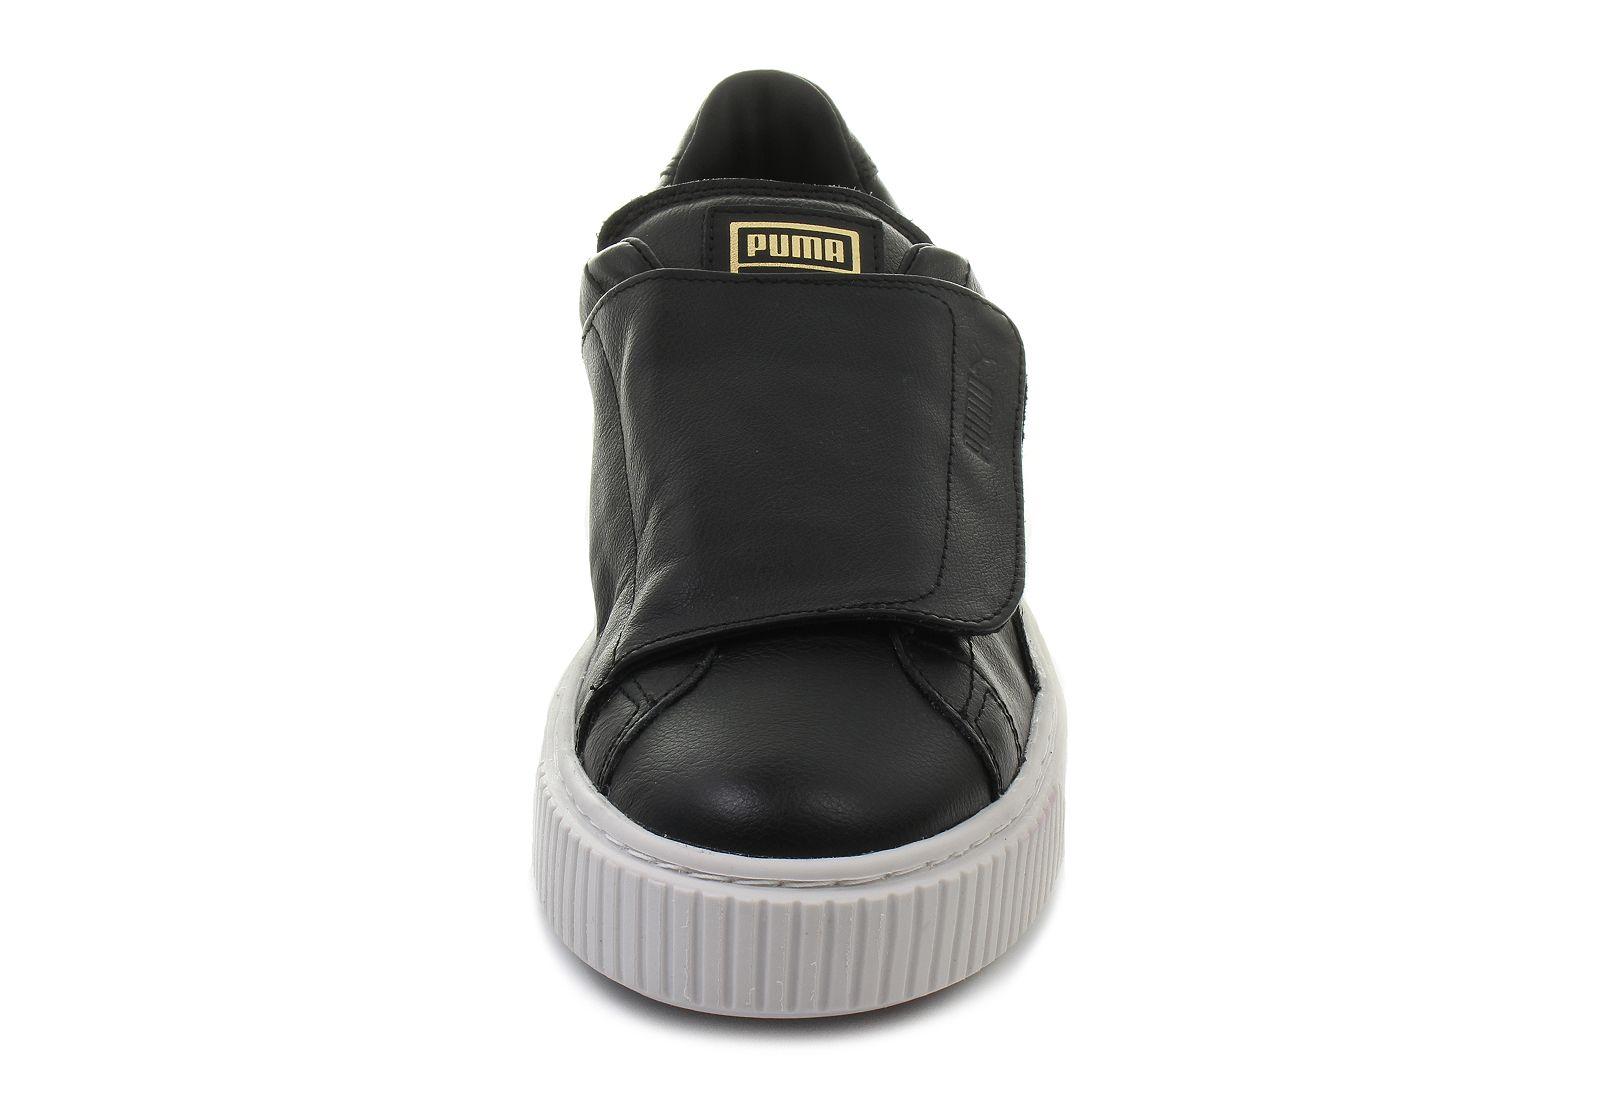 puma shoes basket platform bigvelcwn s 36412301 blk online shop for sneakers shoes and boots. Black Bedroom Furniture Sets. Home Design Ideas